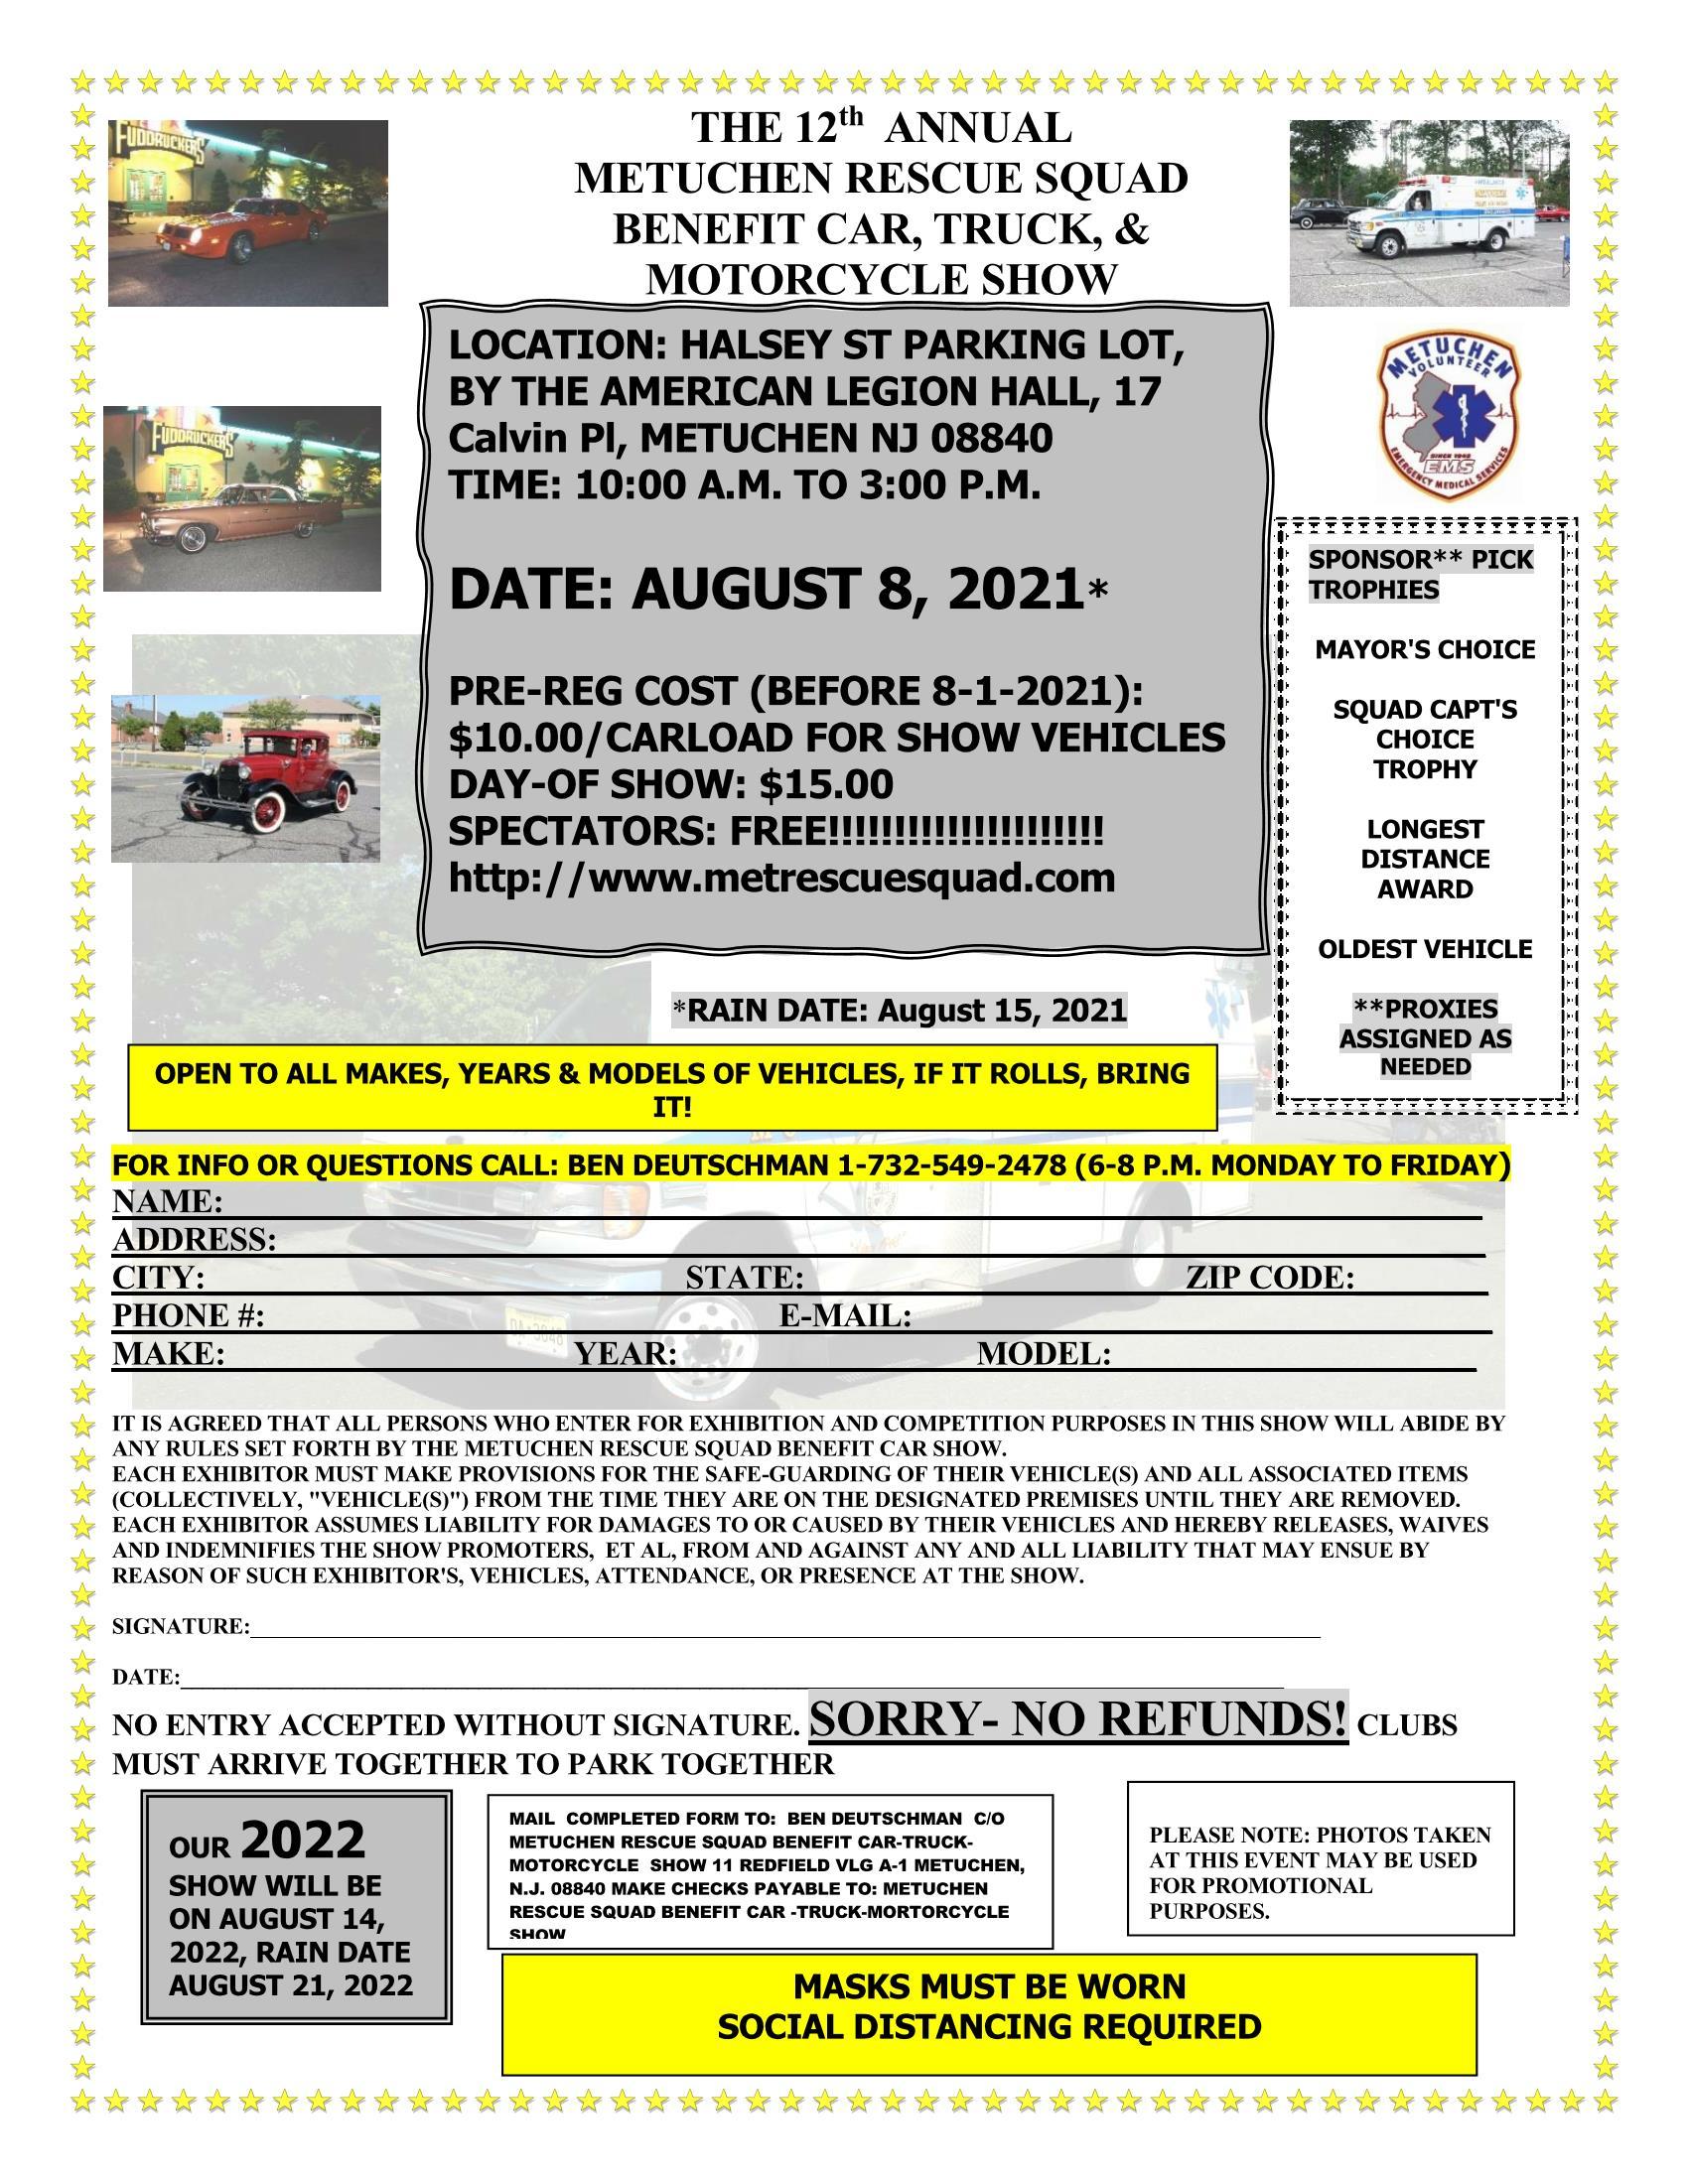 2021SHOWFlyer 2WithEMSLogo HalseyStreetParkingLot Mask SocialDistancingAdded - Metuchen Rescue Squad Benefit Car-Truck-Motorcycle Show